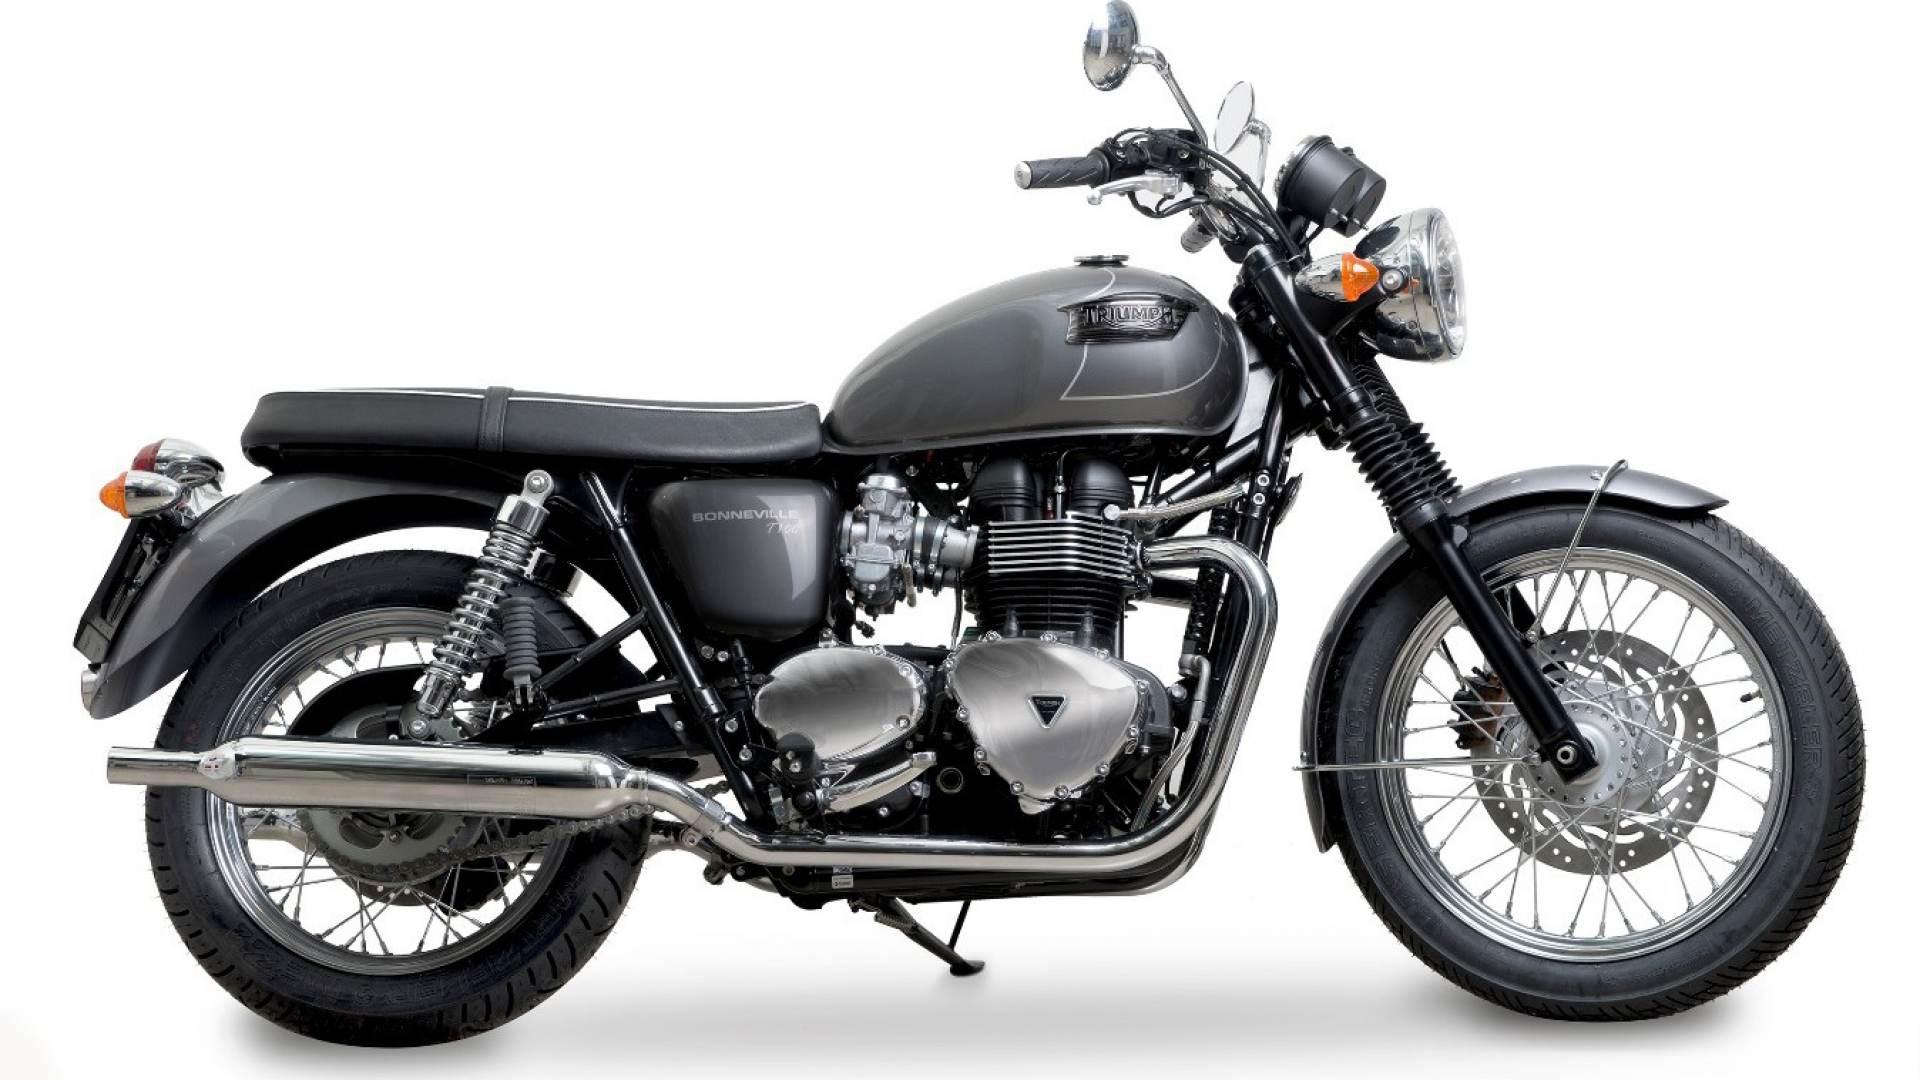 Мотоцикл Triumph Bonneville 750 T140E Special Edition (1980)